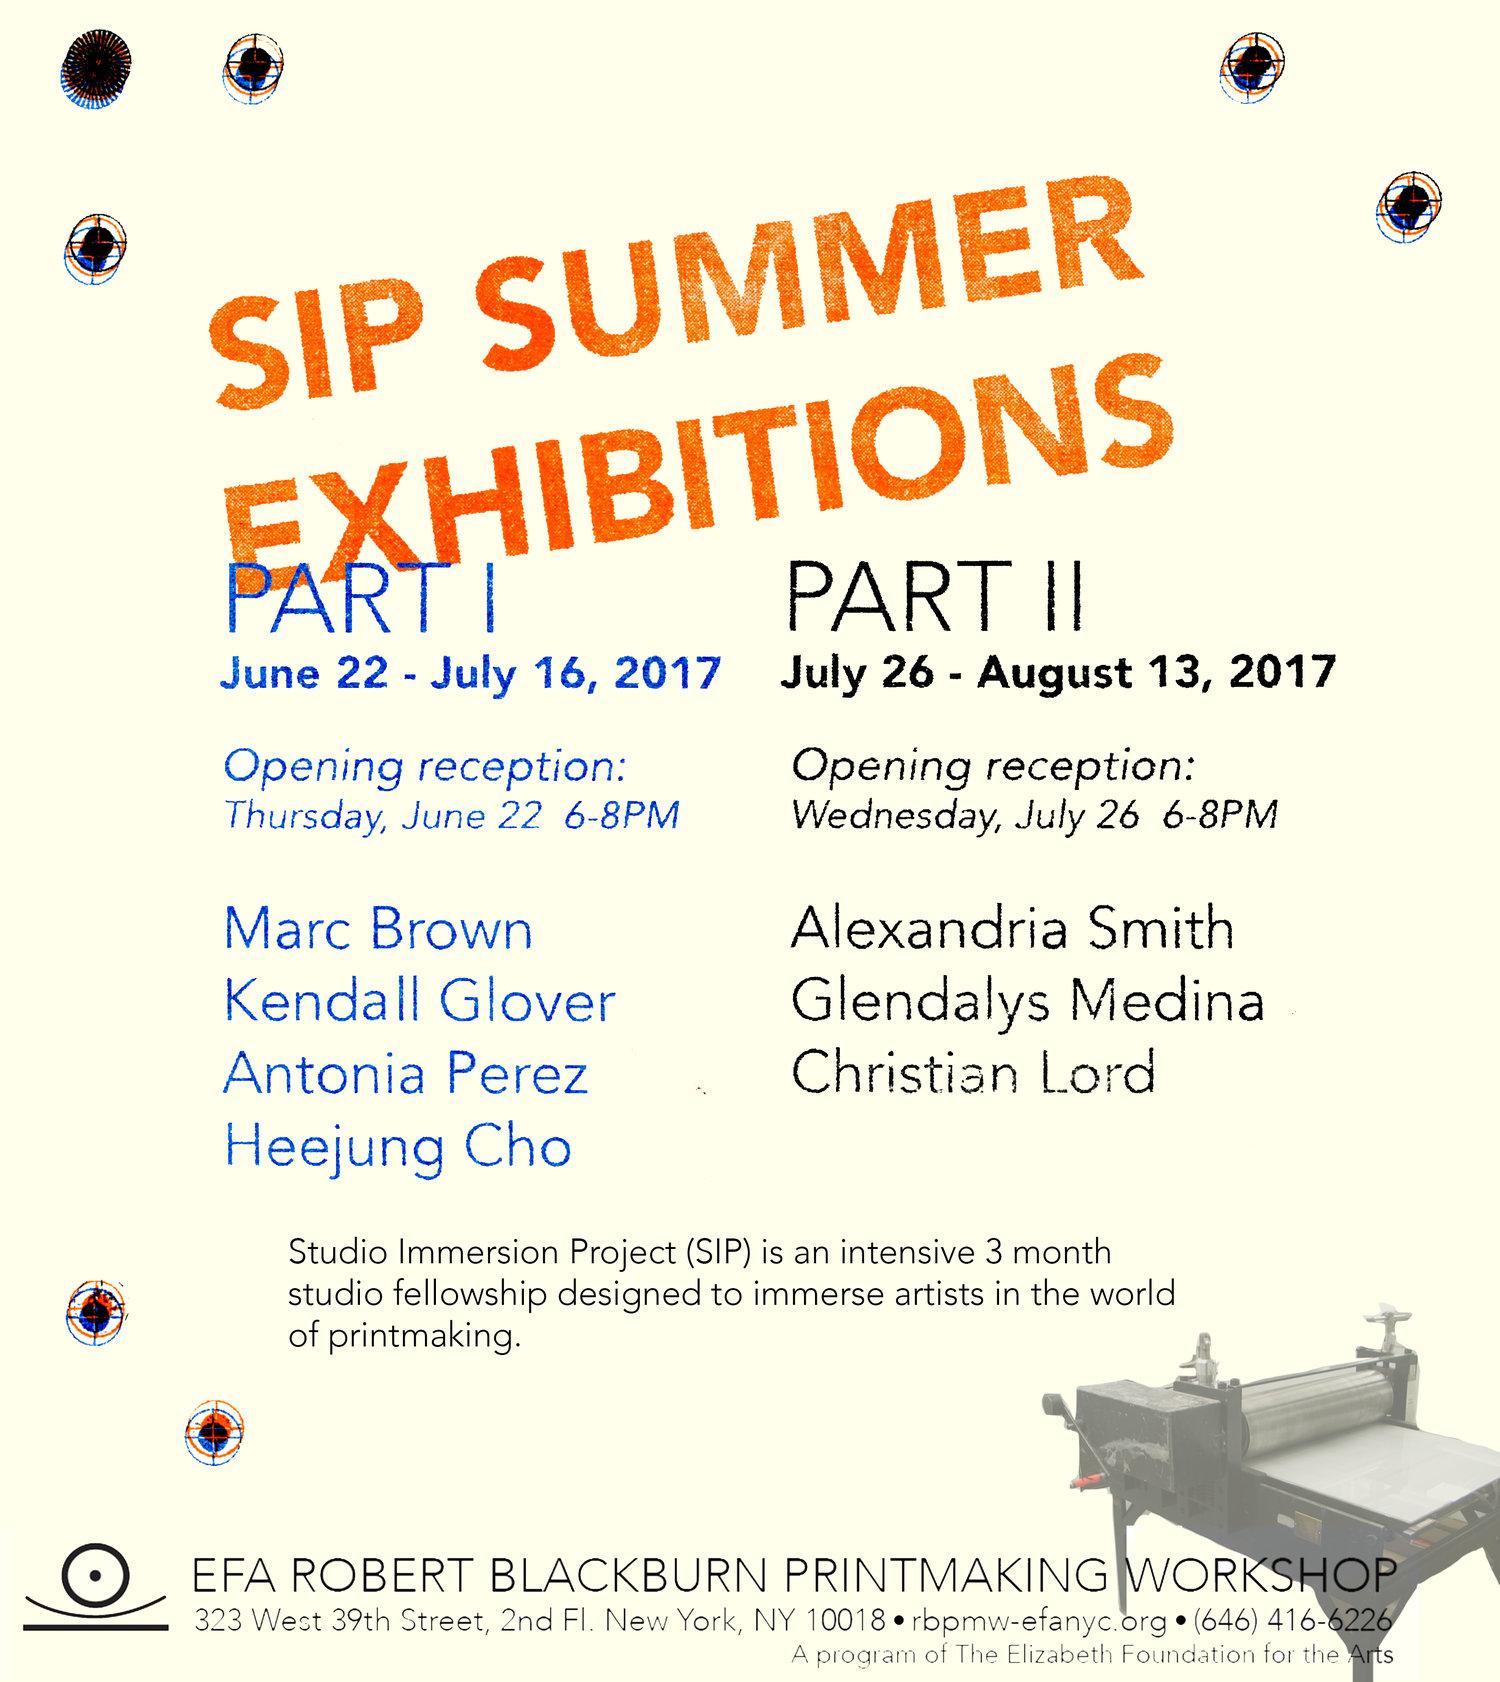 SIP Summer Exhibitions Part 1  June 22 - July 16, 2017